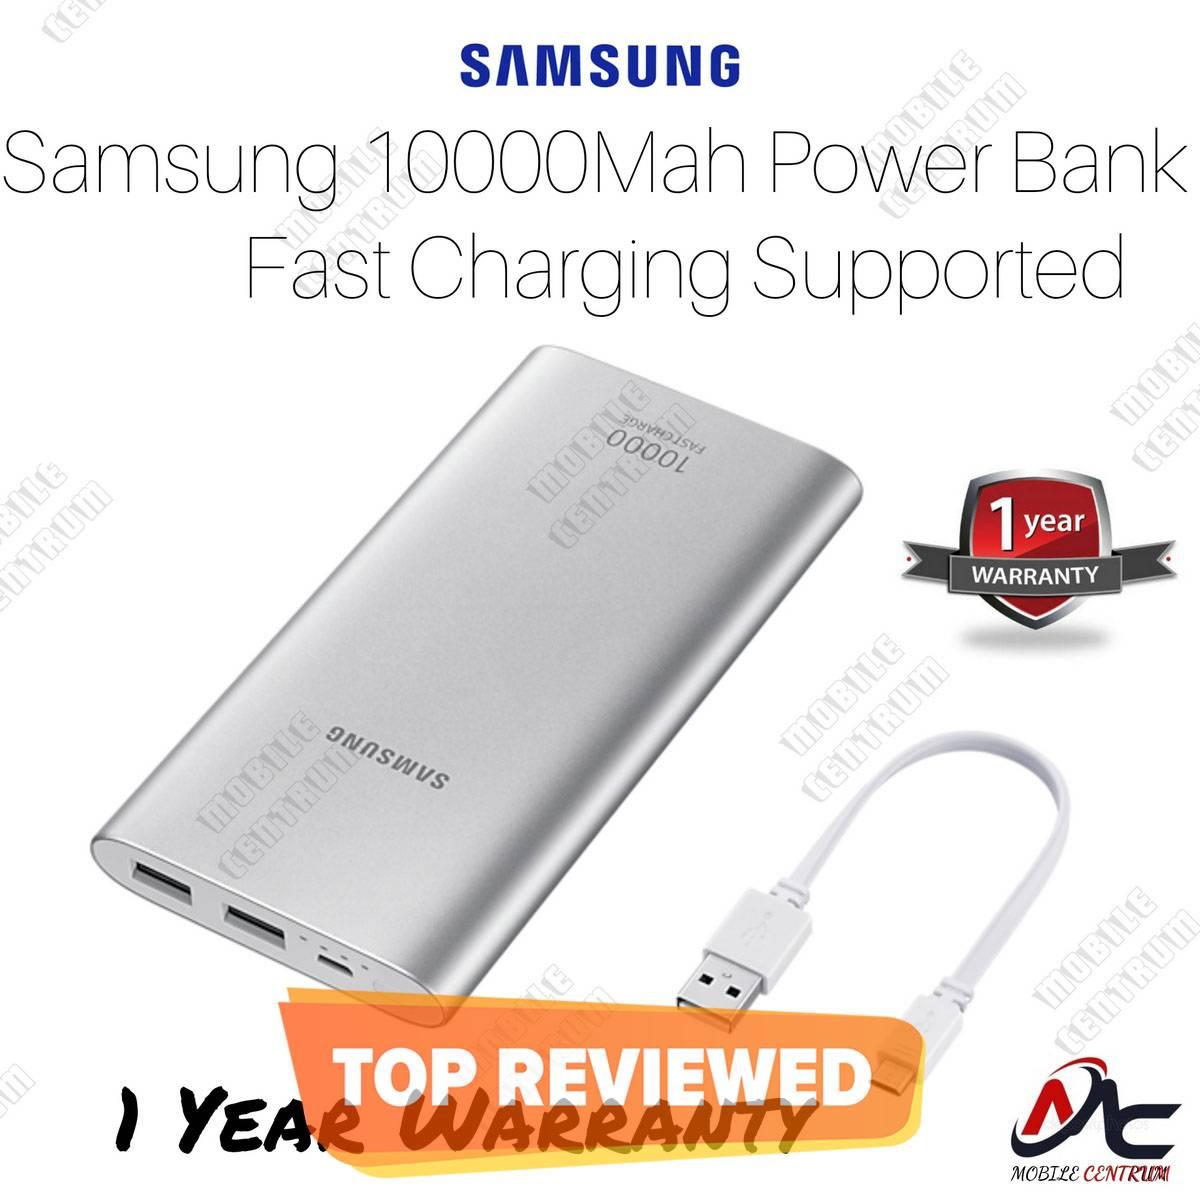 Original Samsung Power Bank Dual USB Port Battery Pack 10000MAH